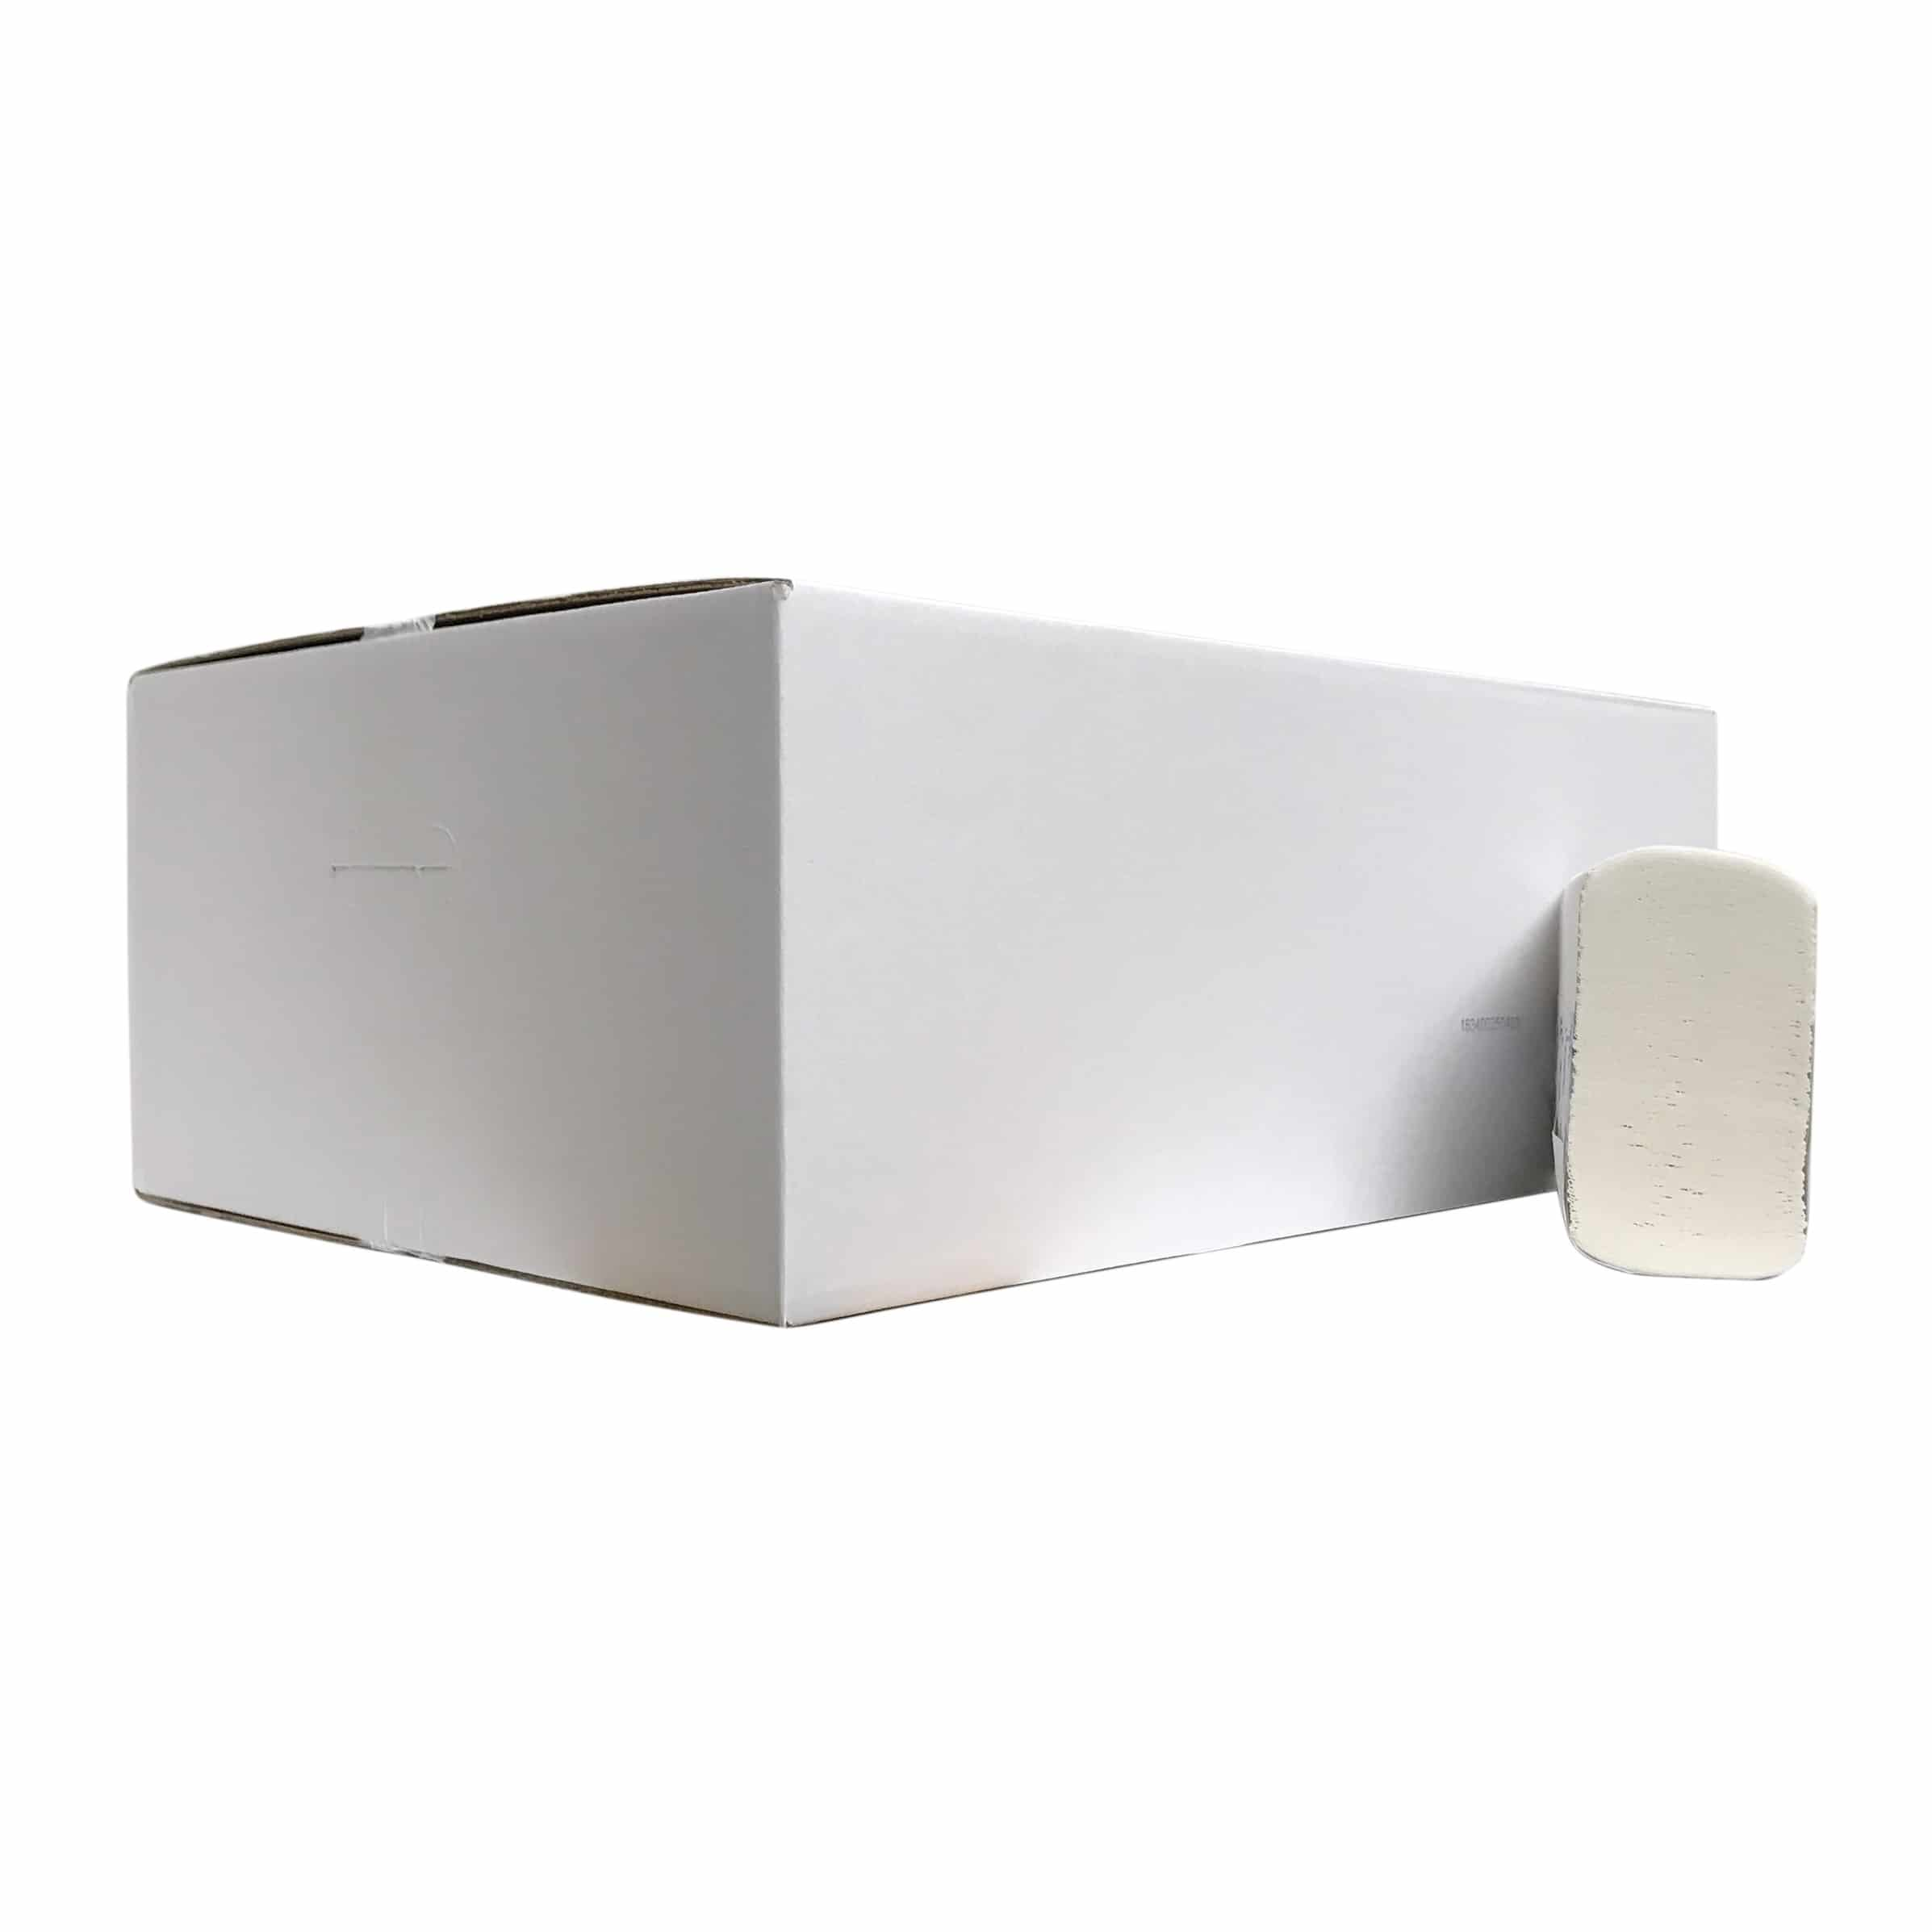 Papieren handdoekjes multifold luxe 2-laags SoftTech - 2000 vel